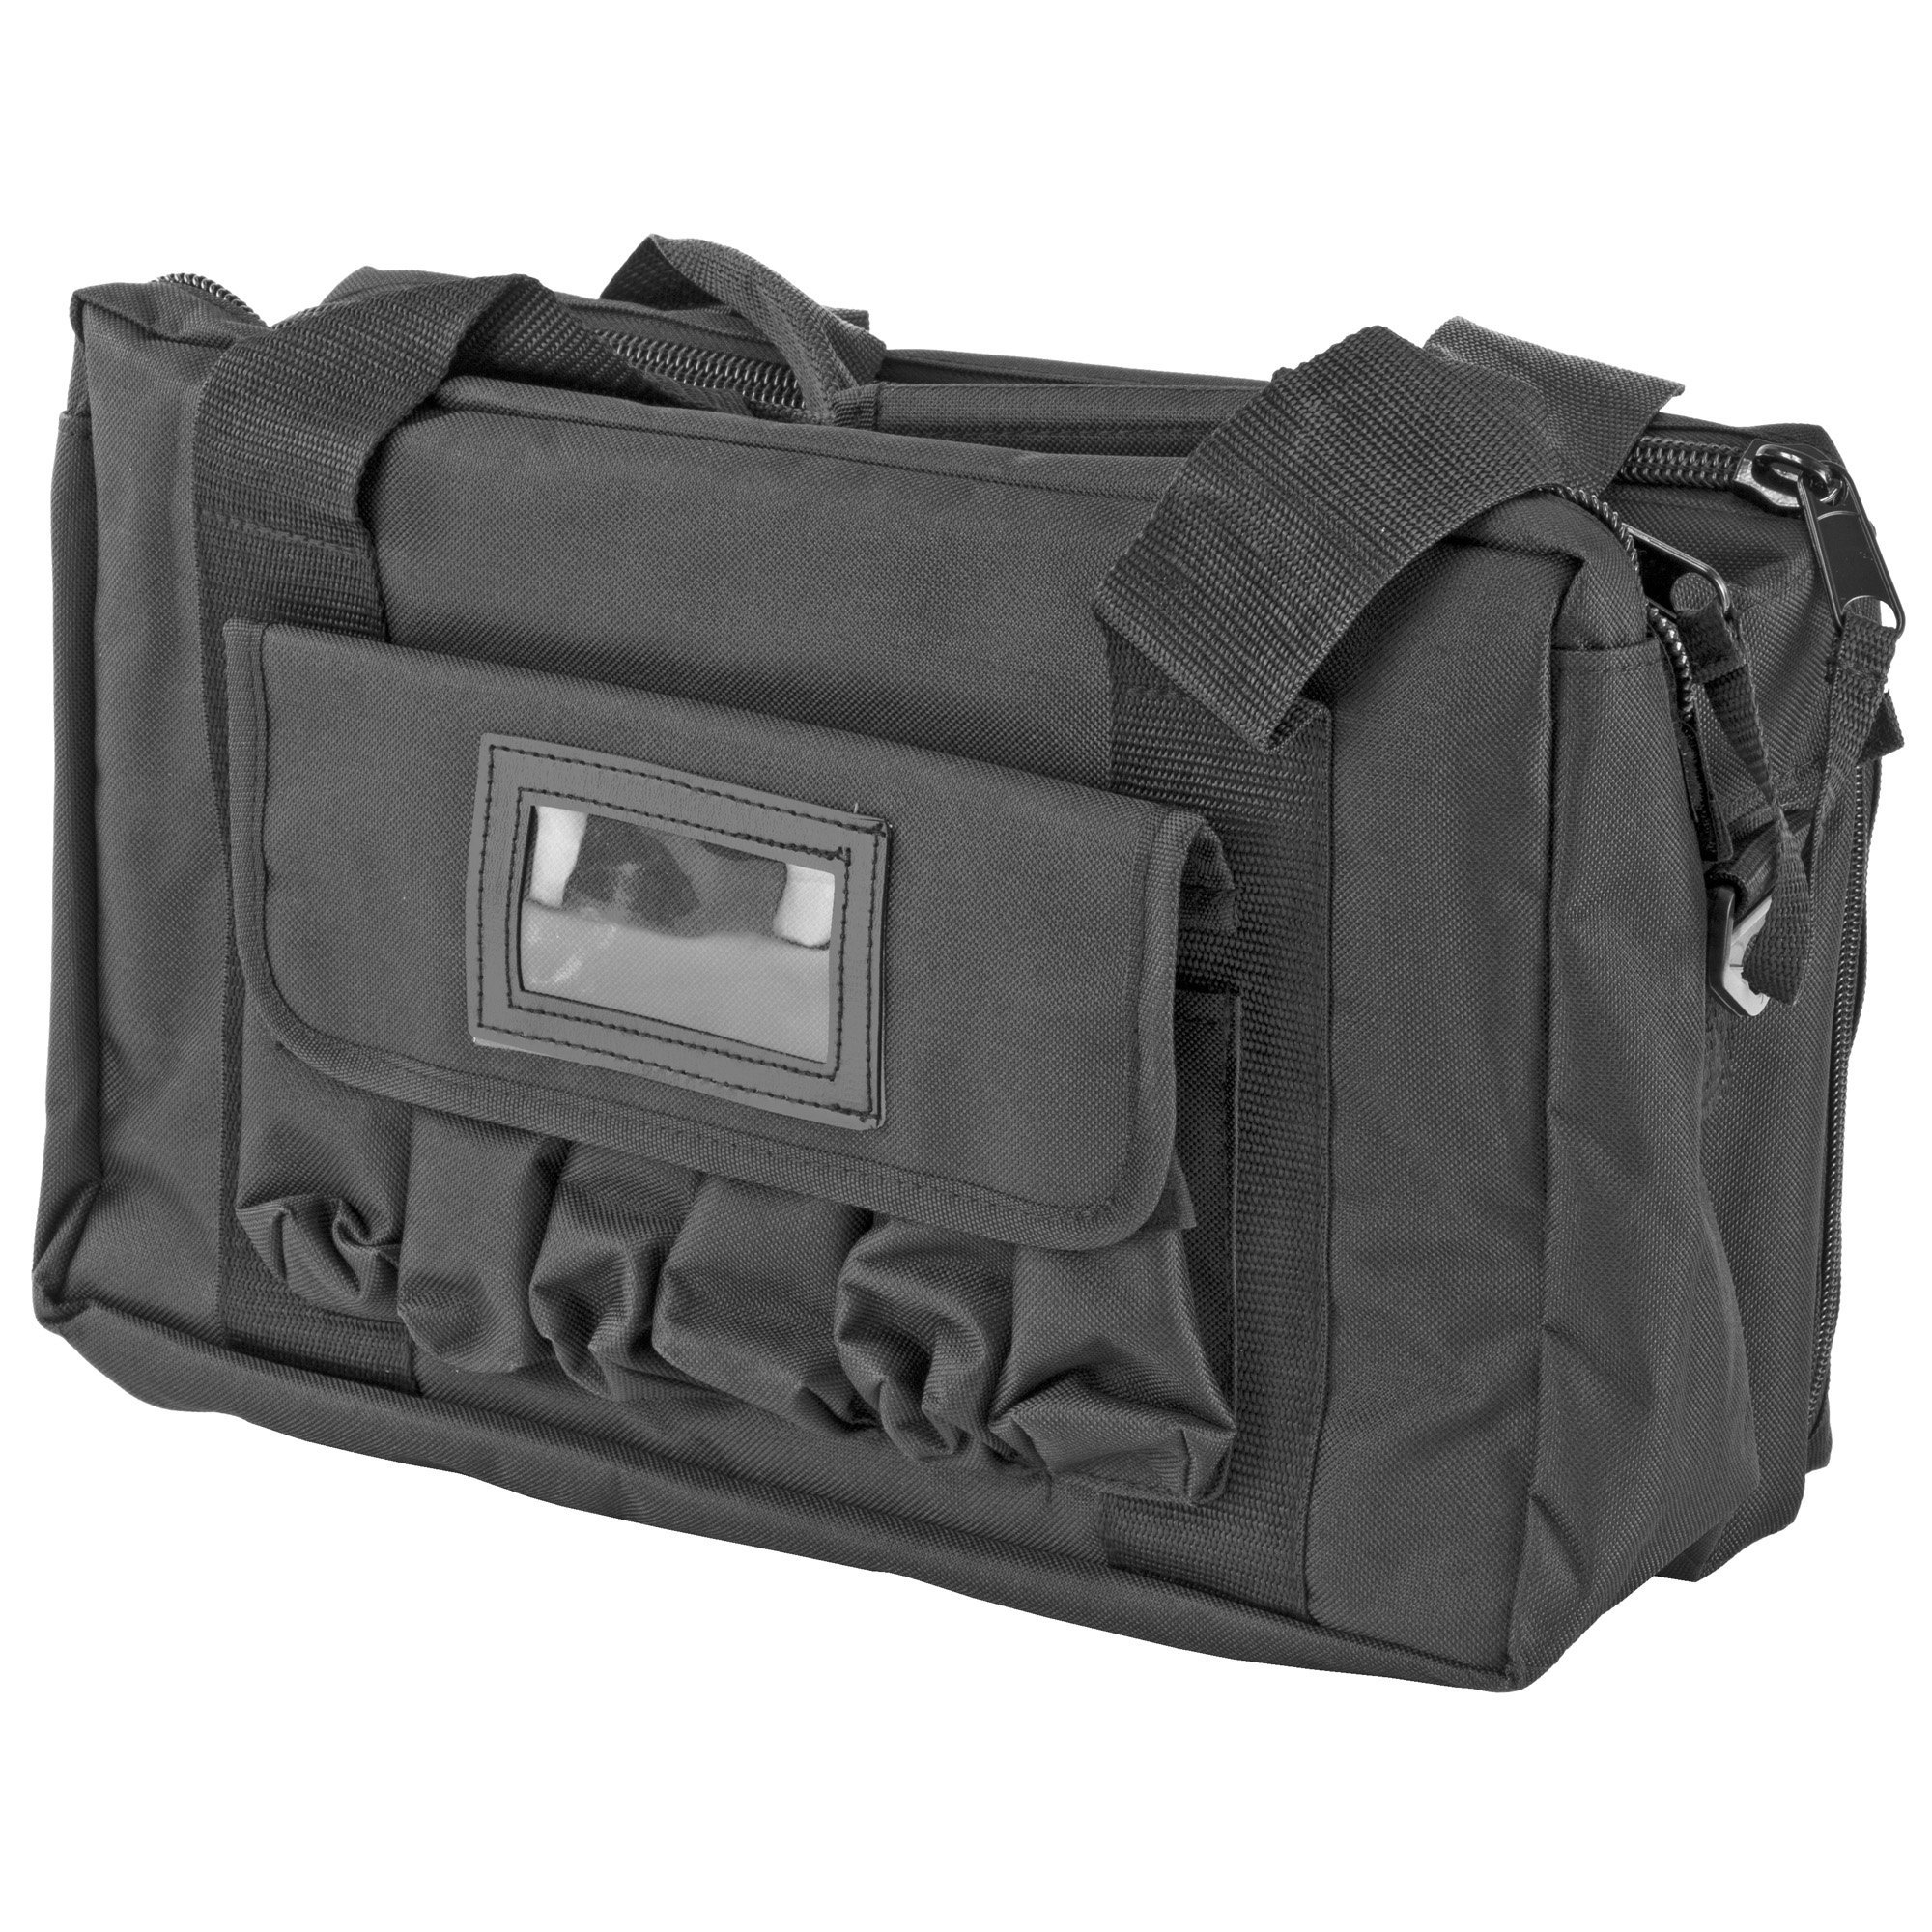 Glock OEM 4 pistol range bag